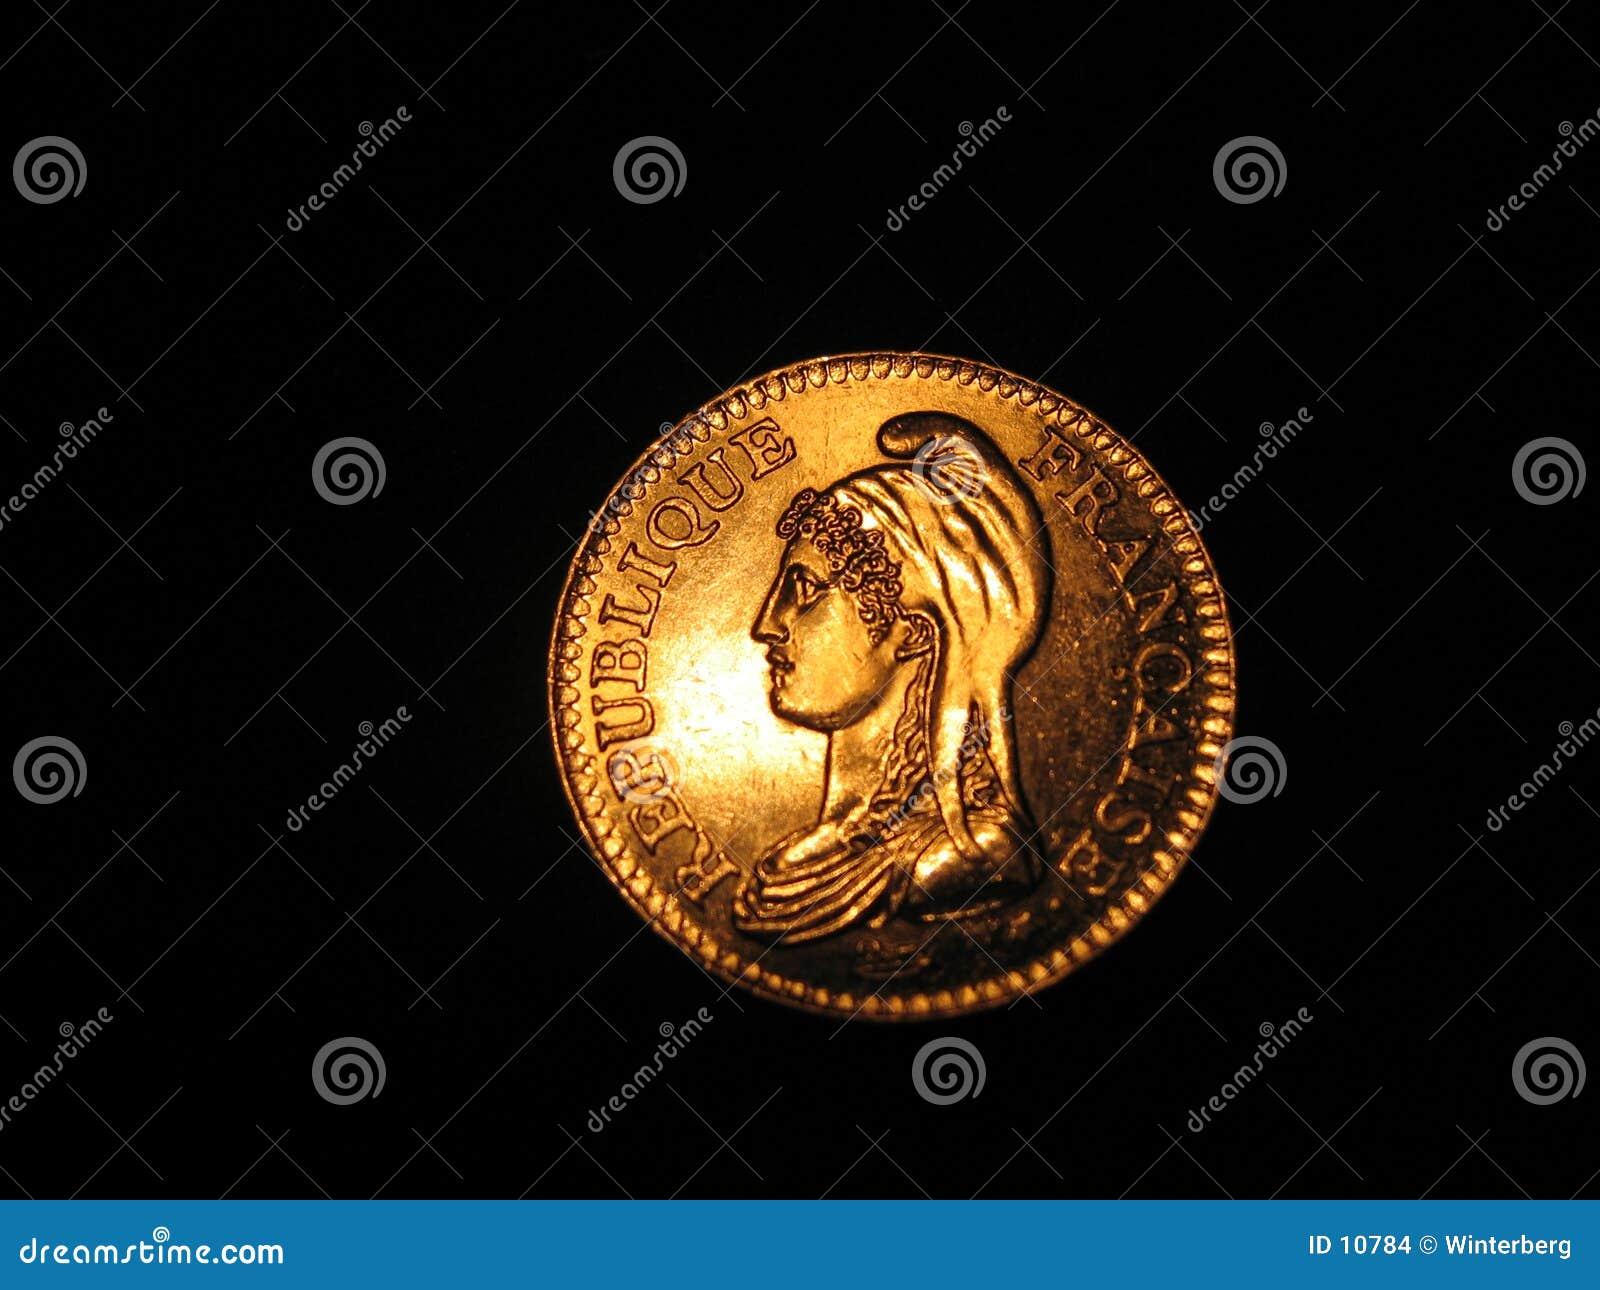 Moneta francese